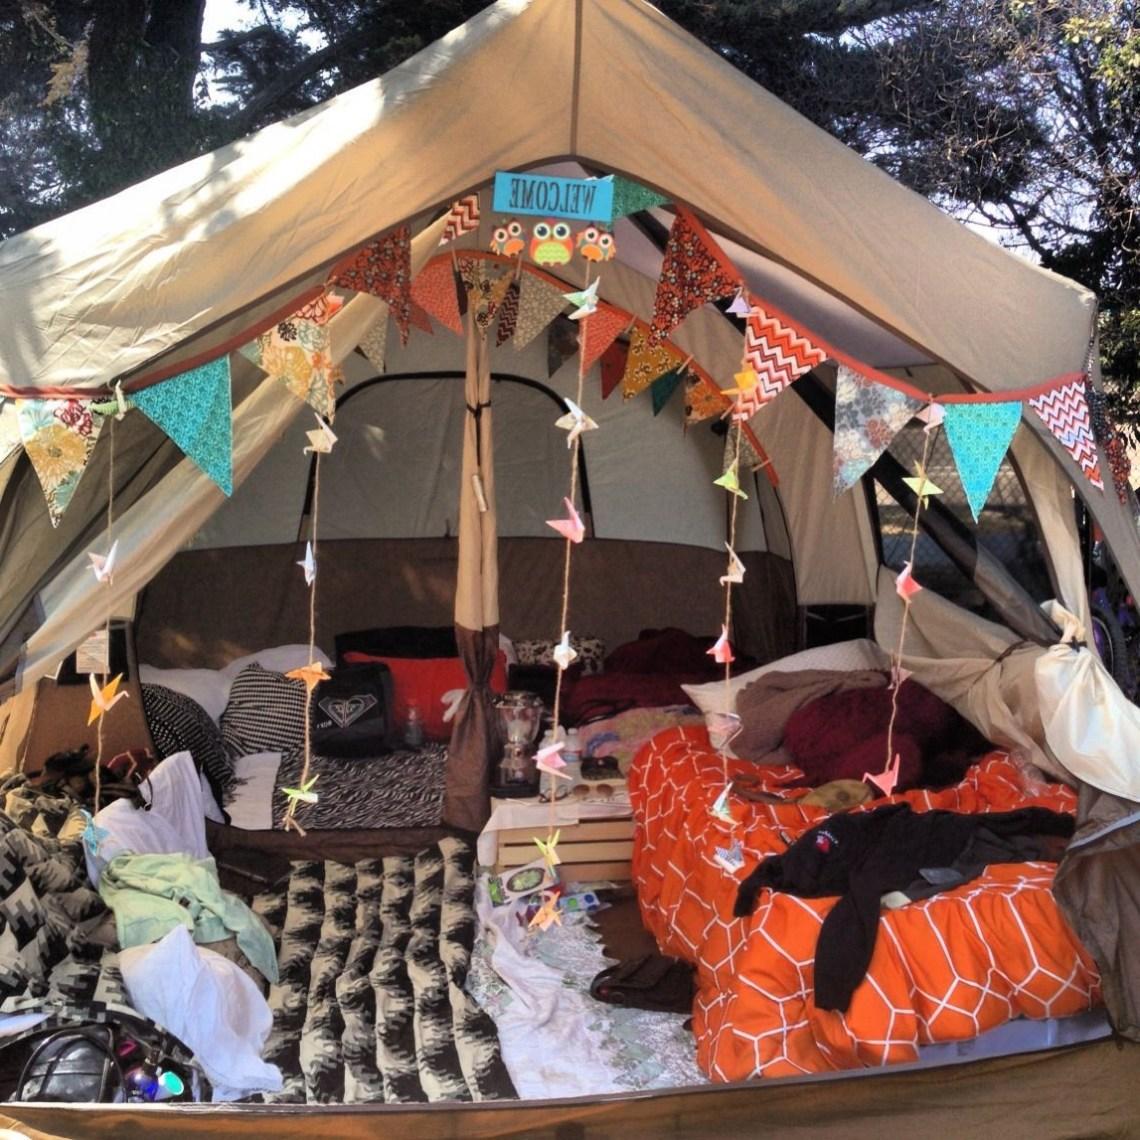 Tent Glamping Festival Camping Setup Coachella Camping